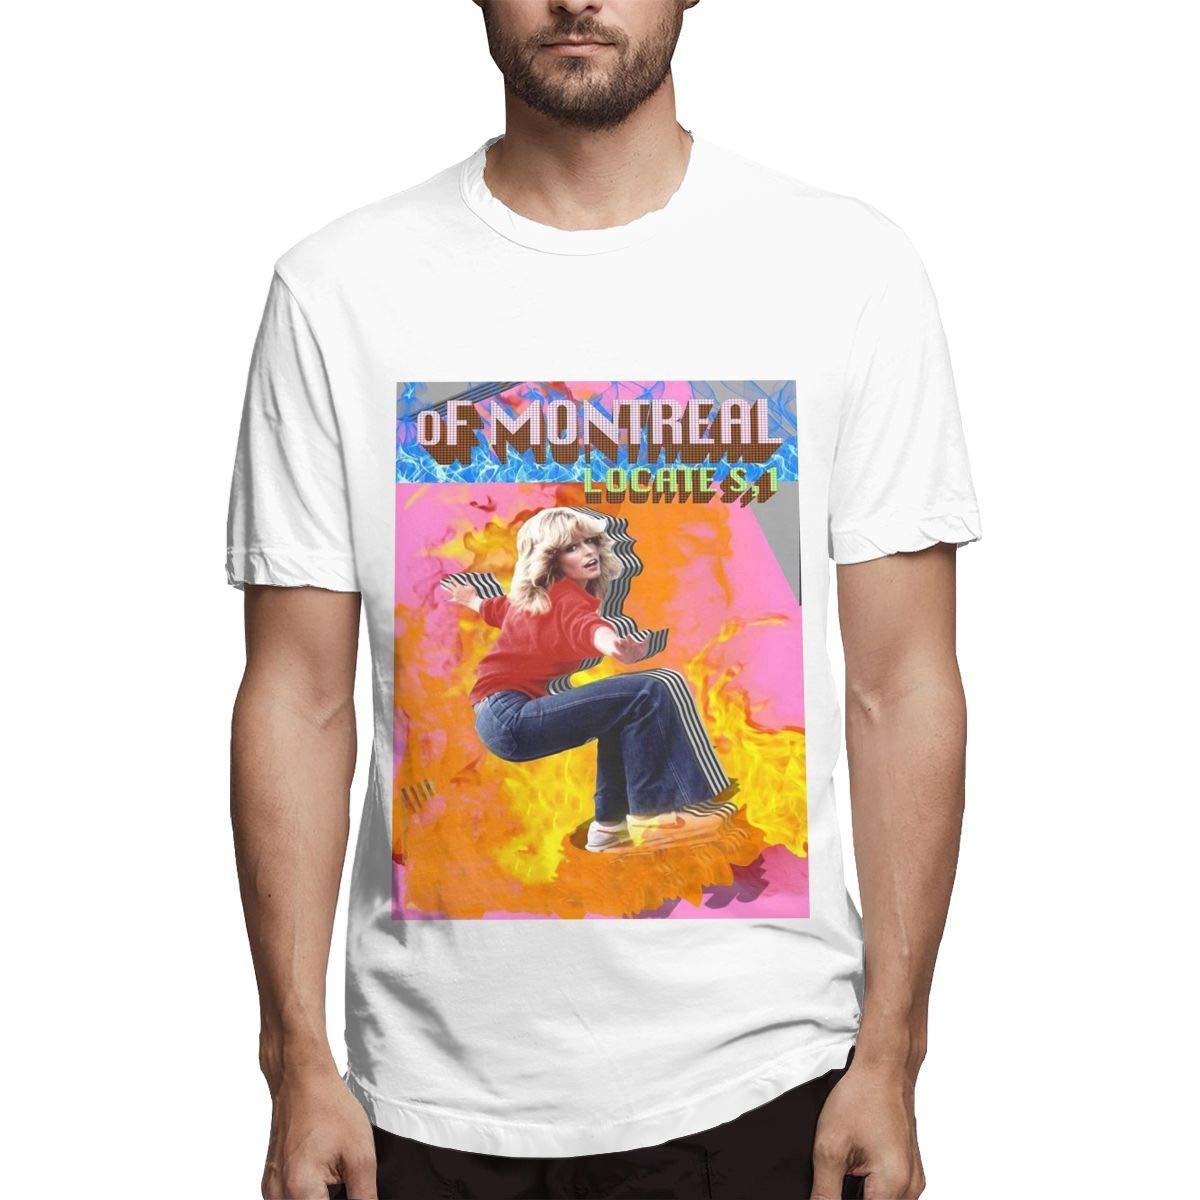 Lihehen S Of Montreal Retro Printing Round Neck Shirts